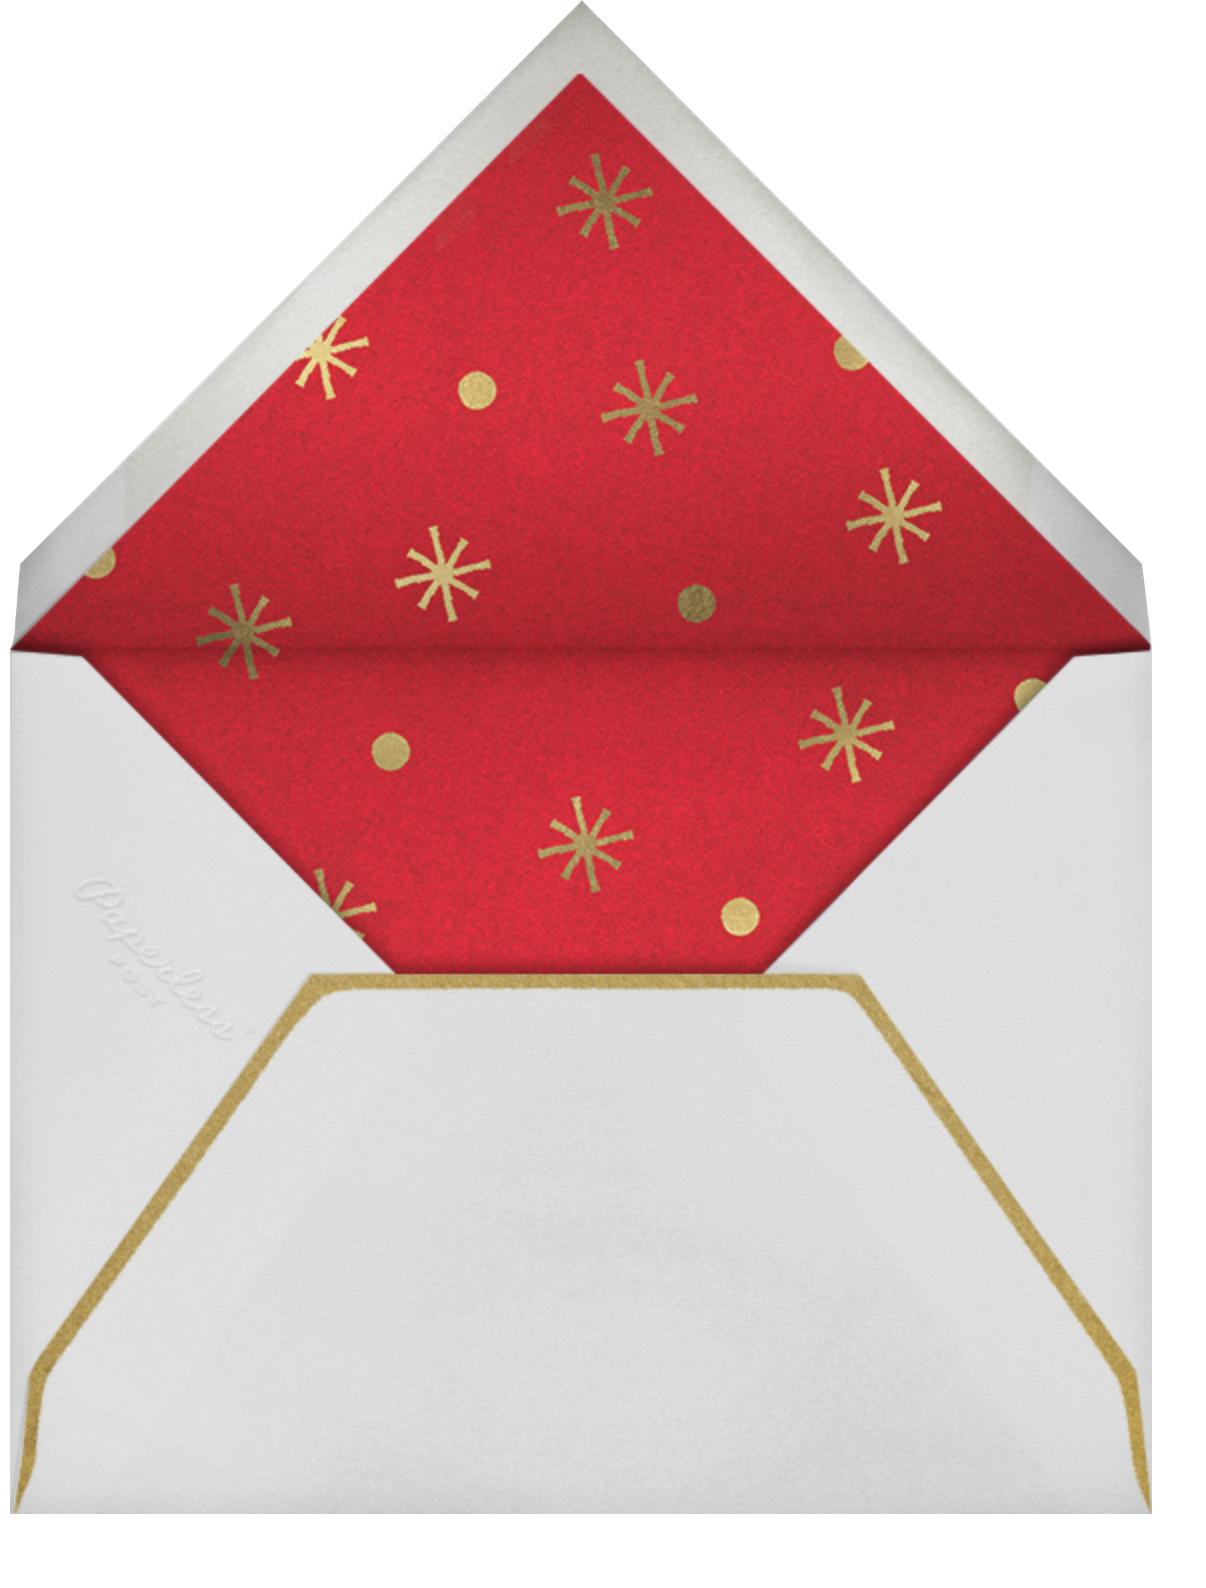 Gold Santa - Paperless Post - Gift exchange - envelope back